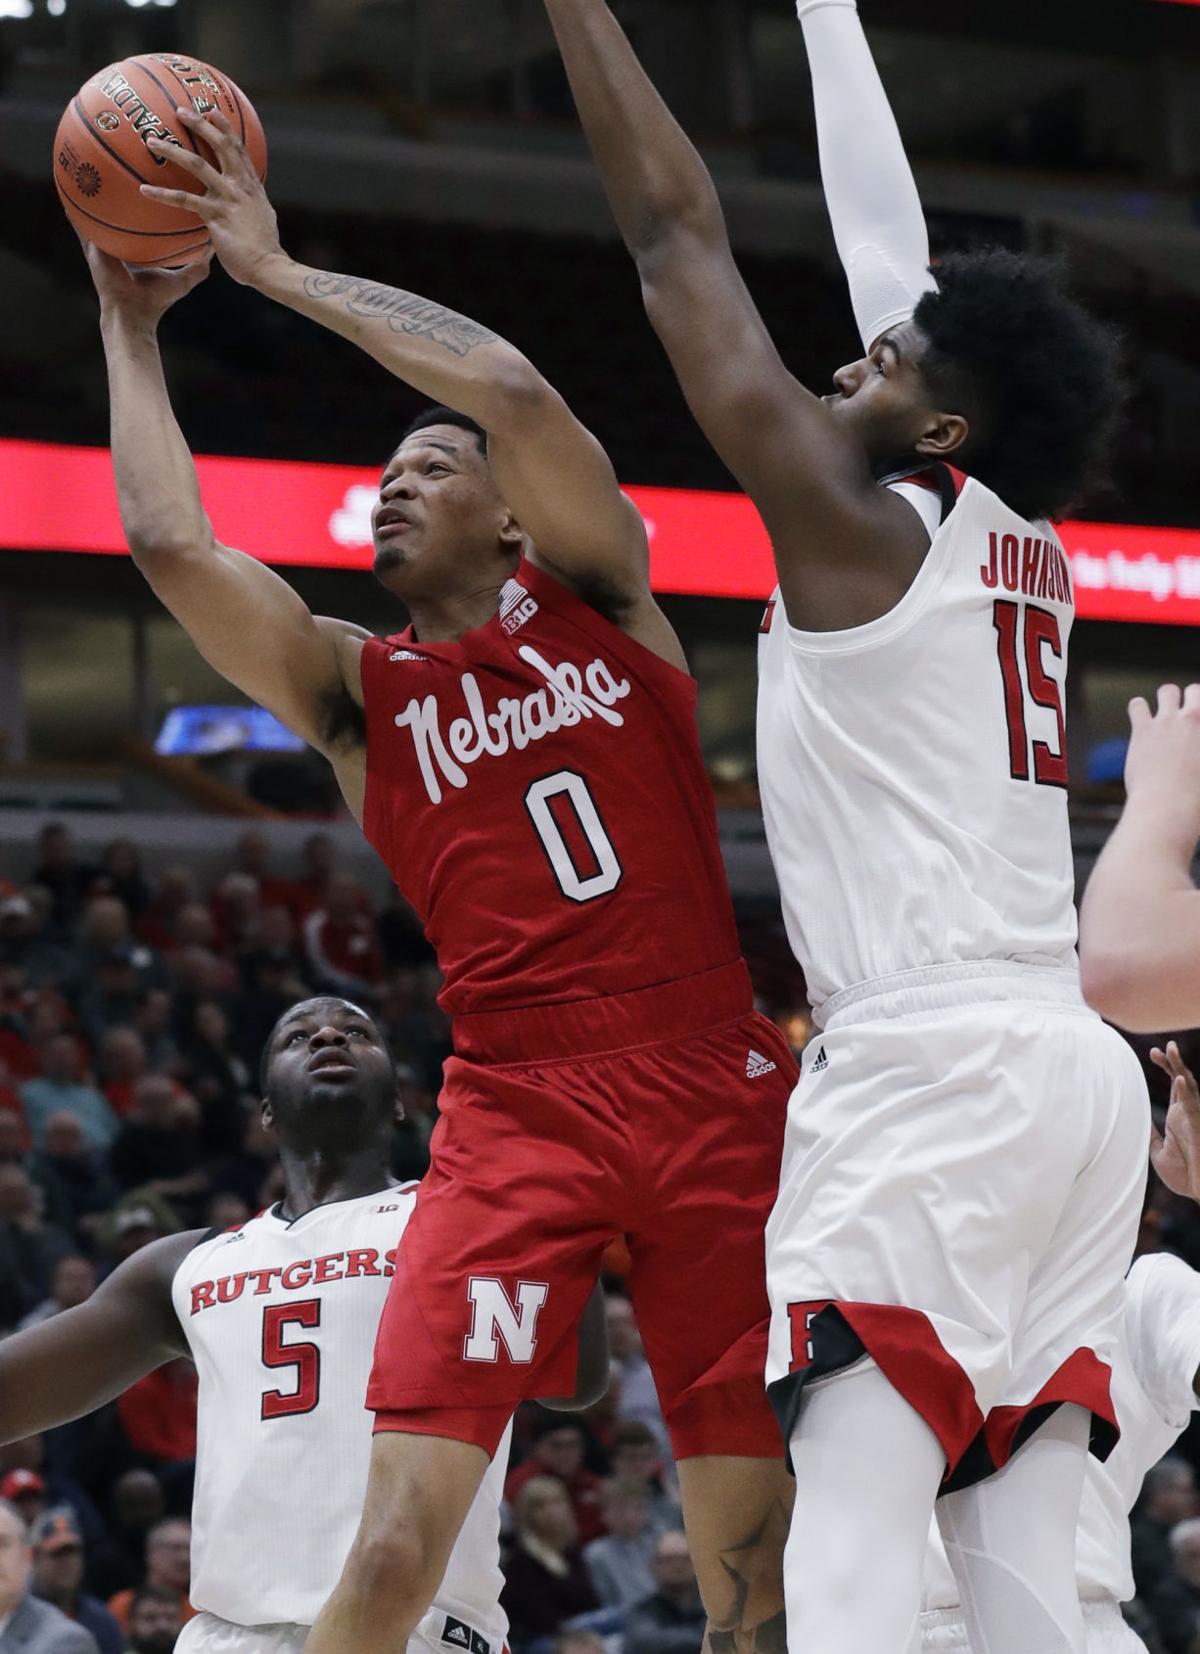 B10 Nebraska Rutgers Basketball